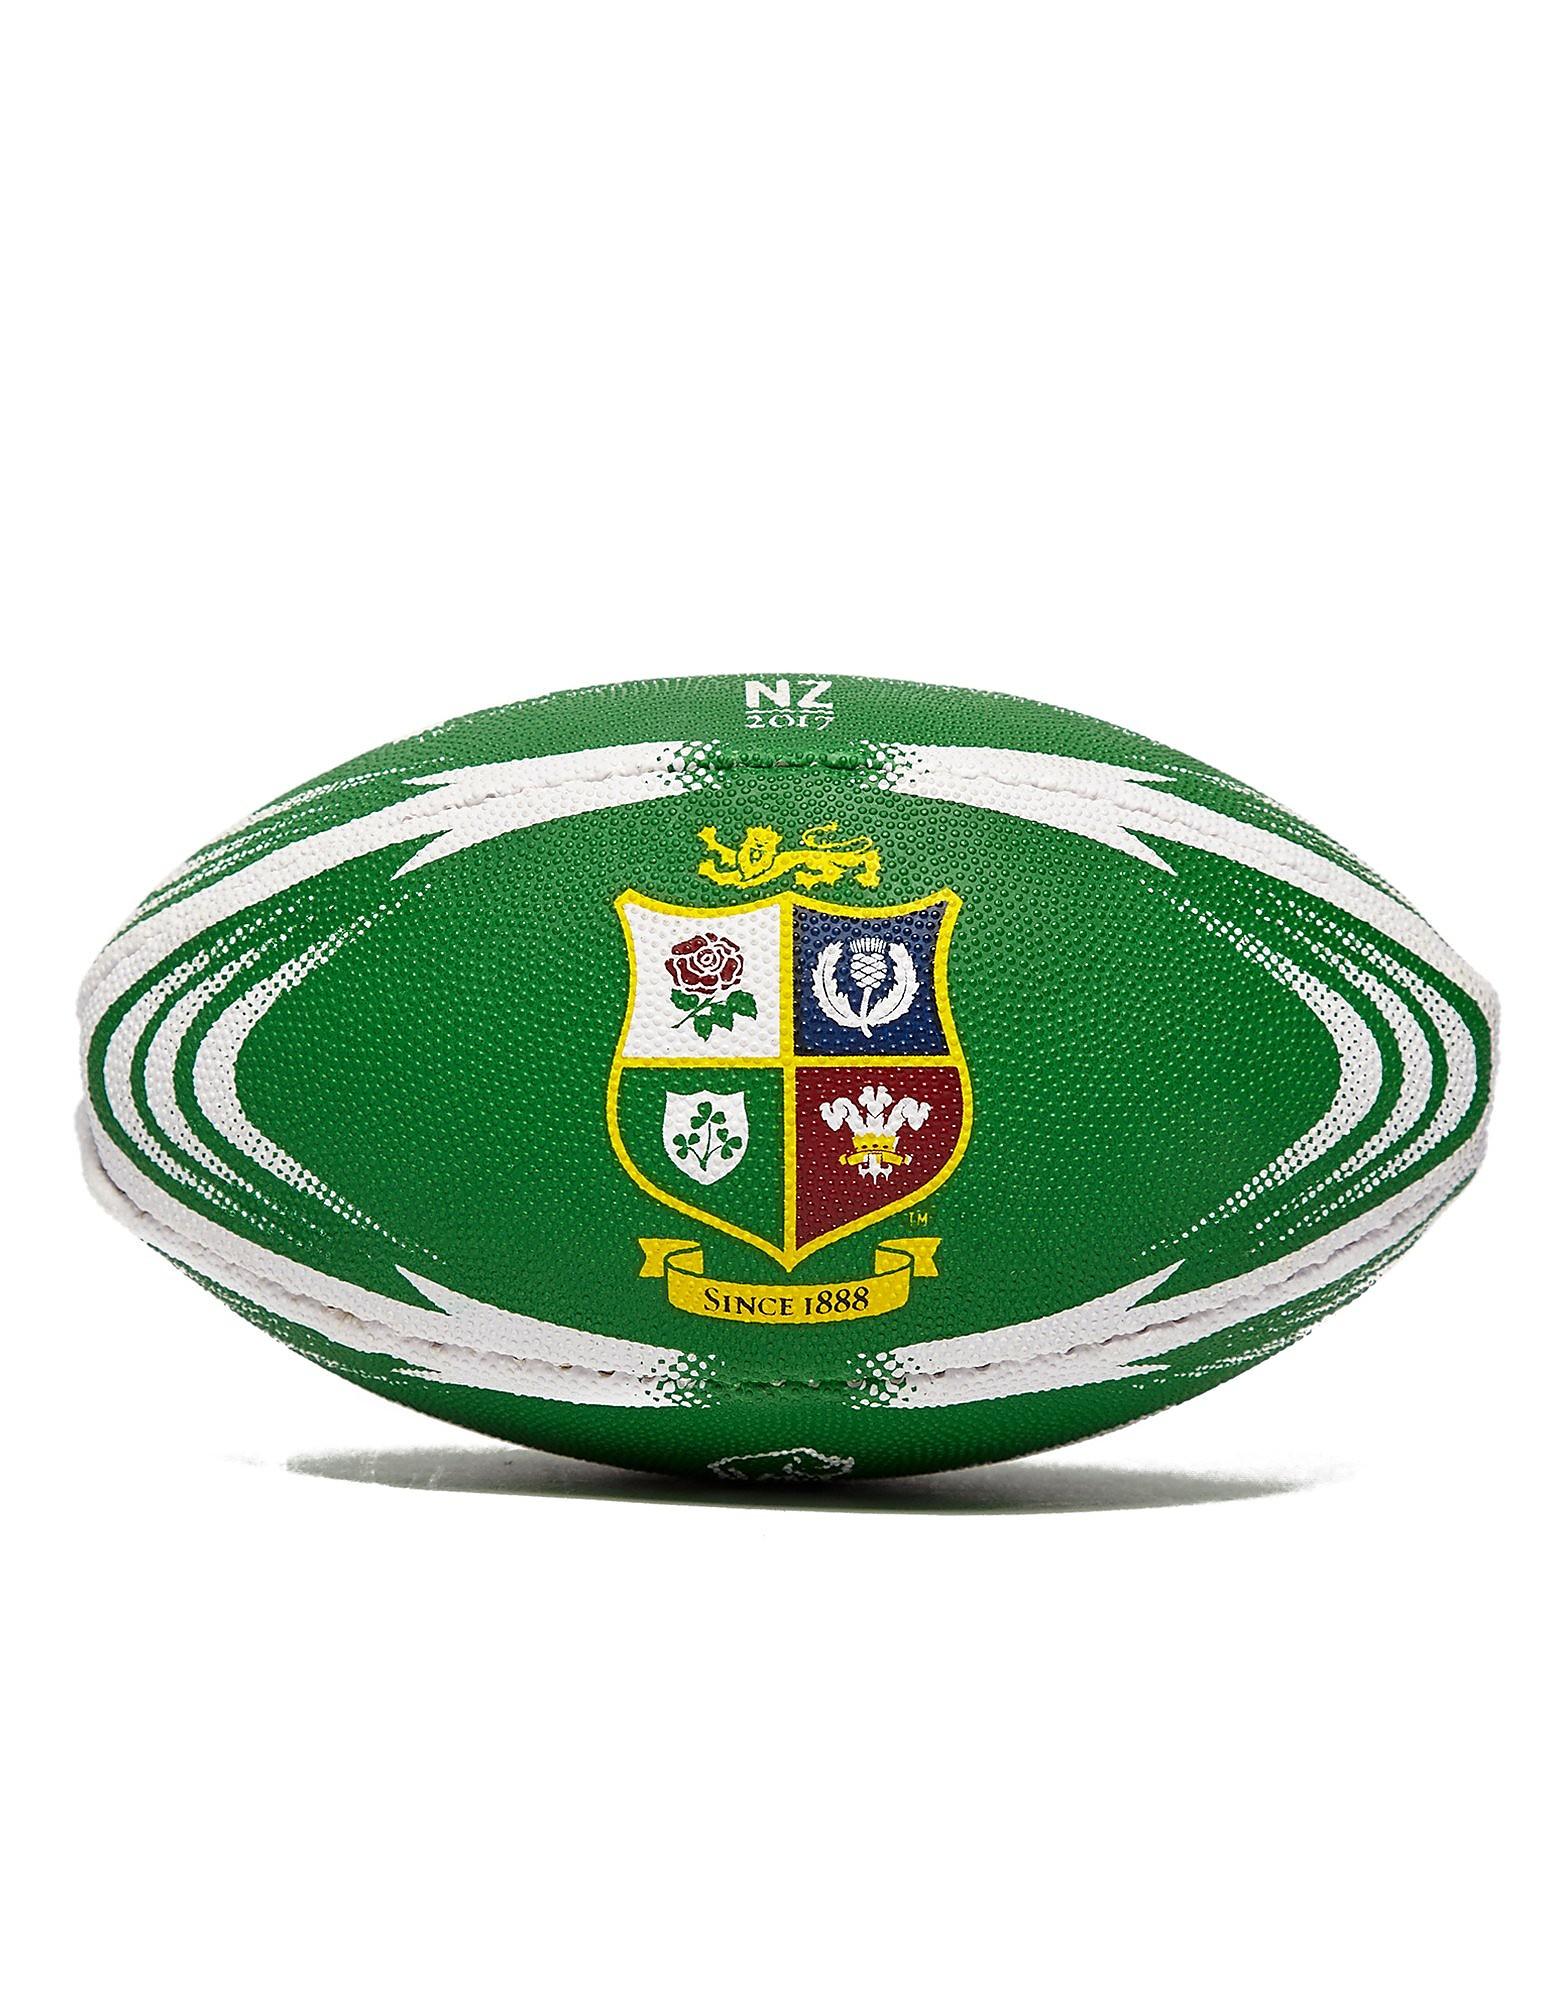 Rhino teamwear Rhino British Lions Supporter Mini Rugby Ball